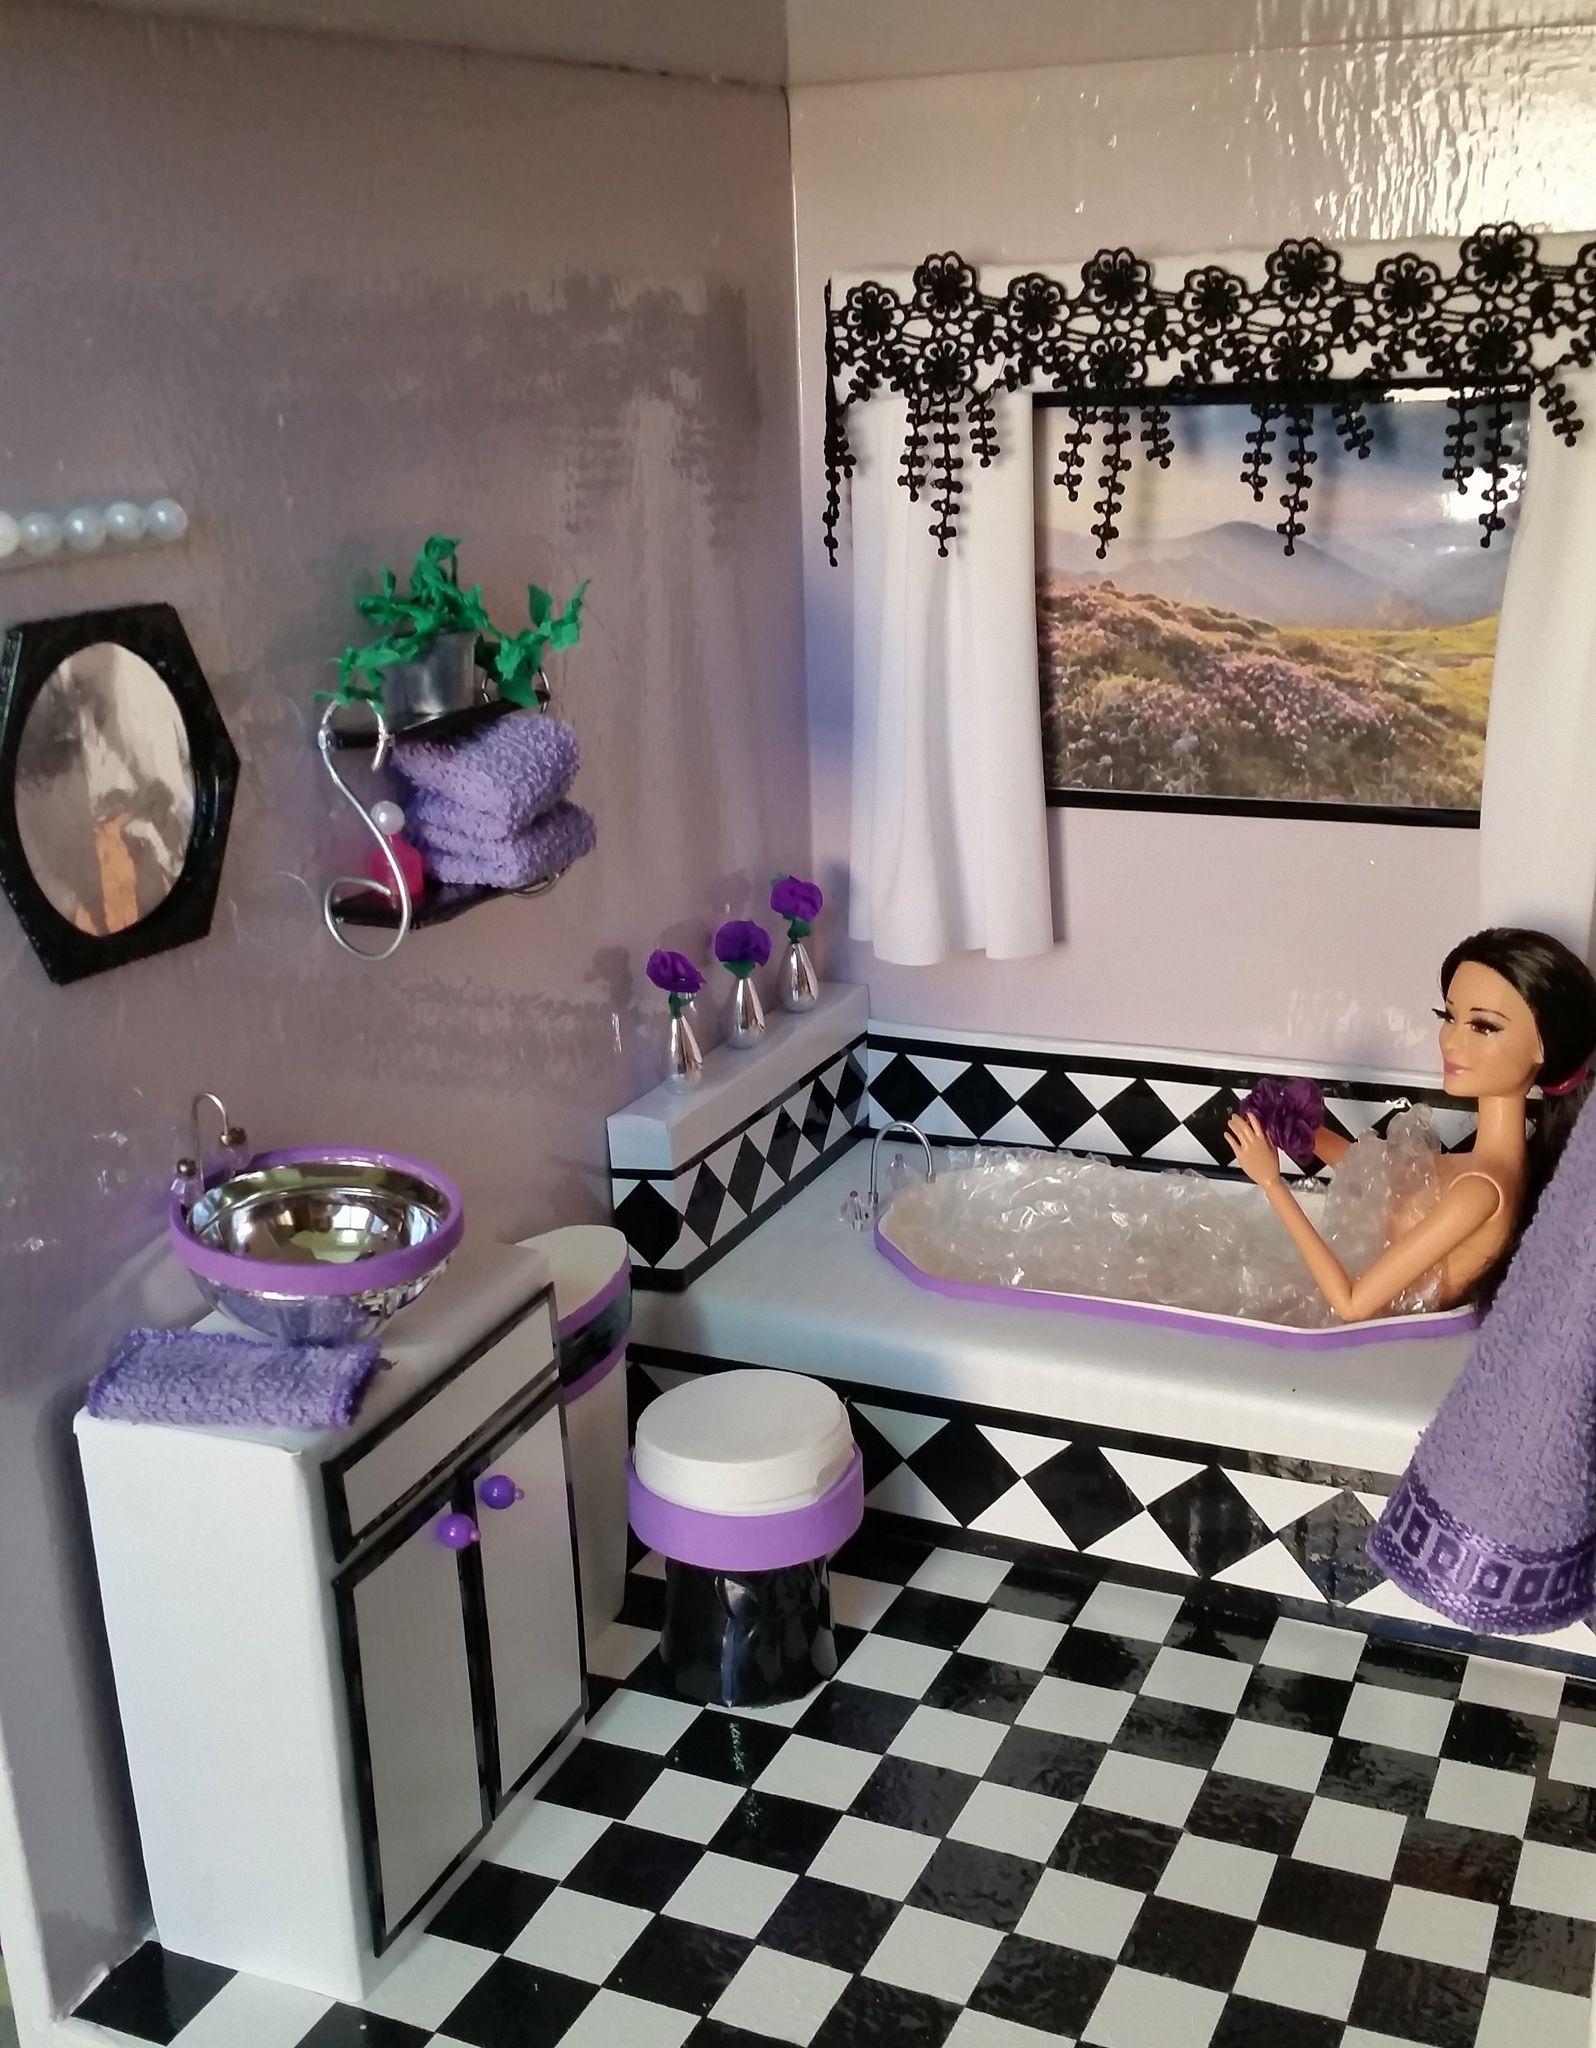 1//6 scale doll size minimalist bathroom set for barbie and ken dolls